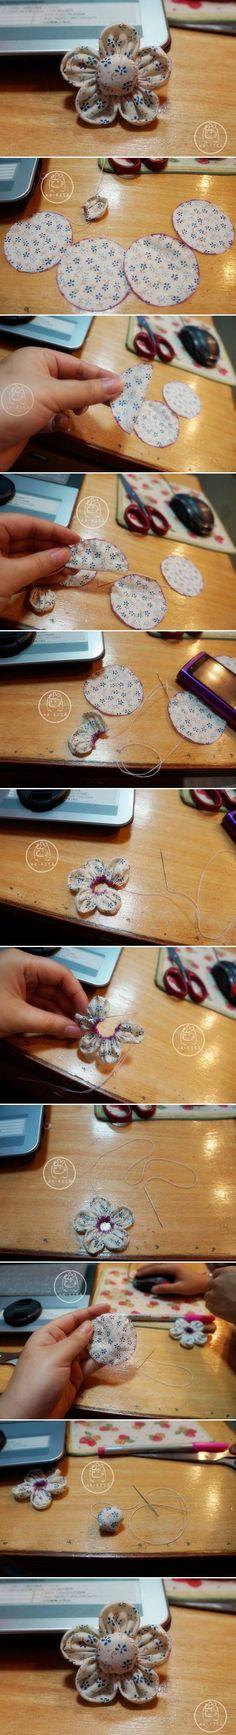 DIY Quick Handmade Fabric Flower DIY Quick Handmade Fabric Flower